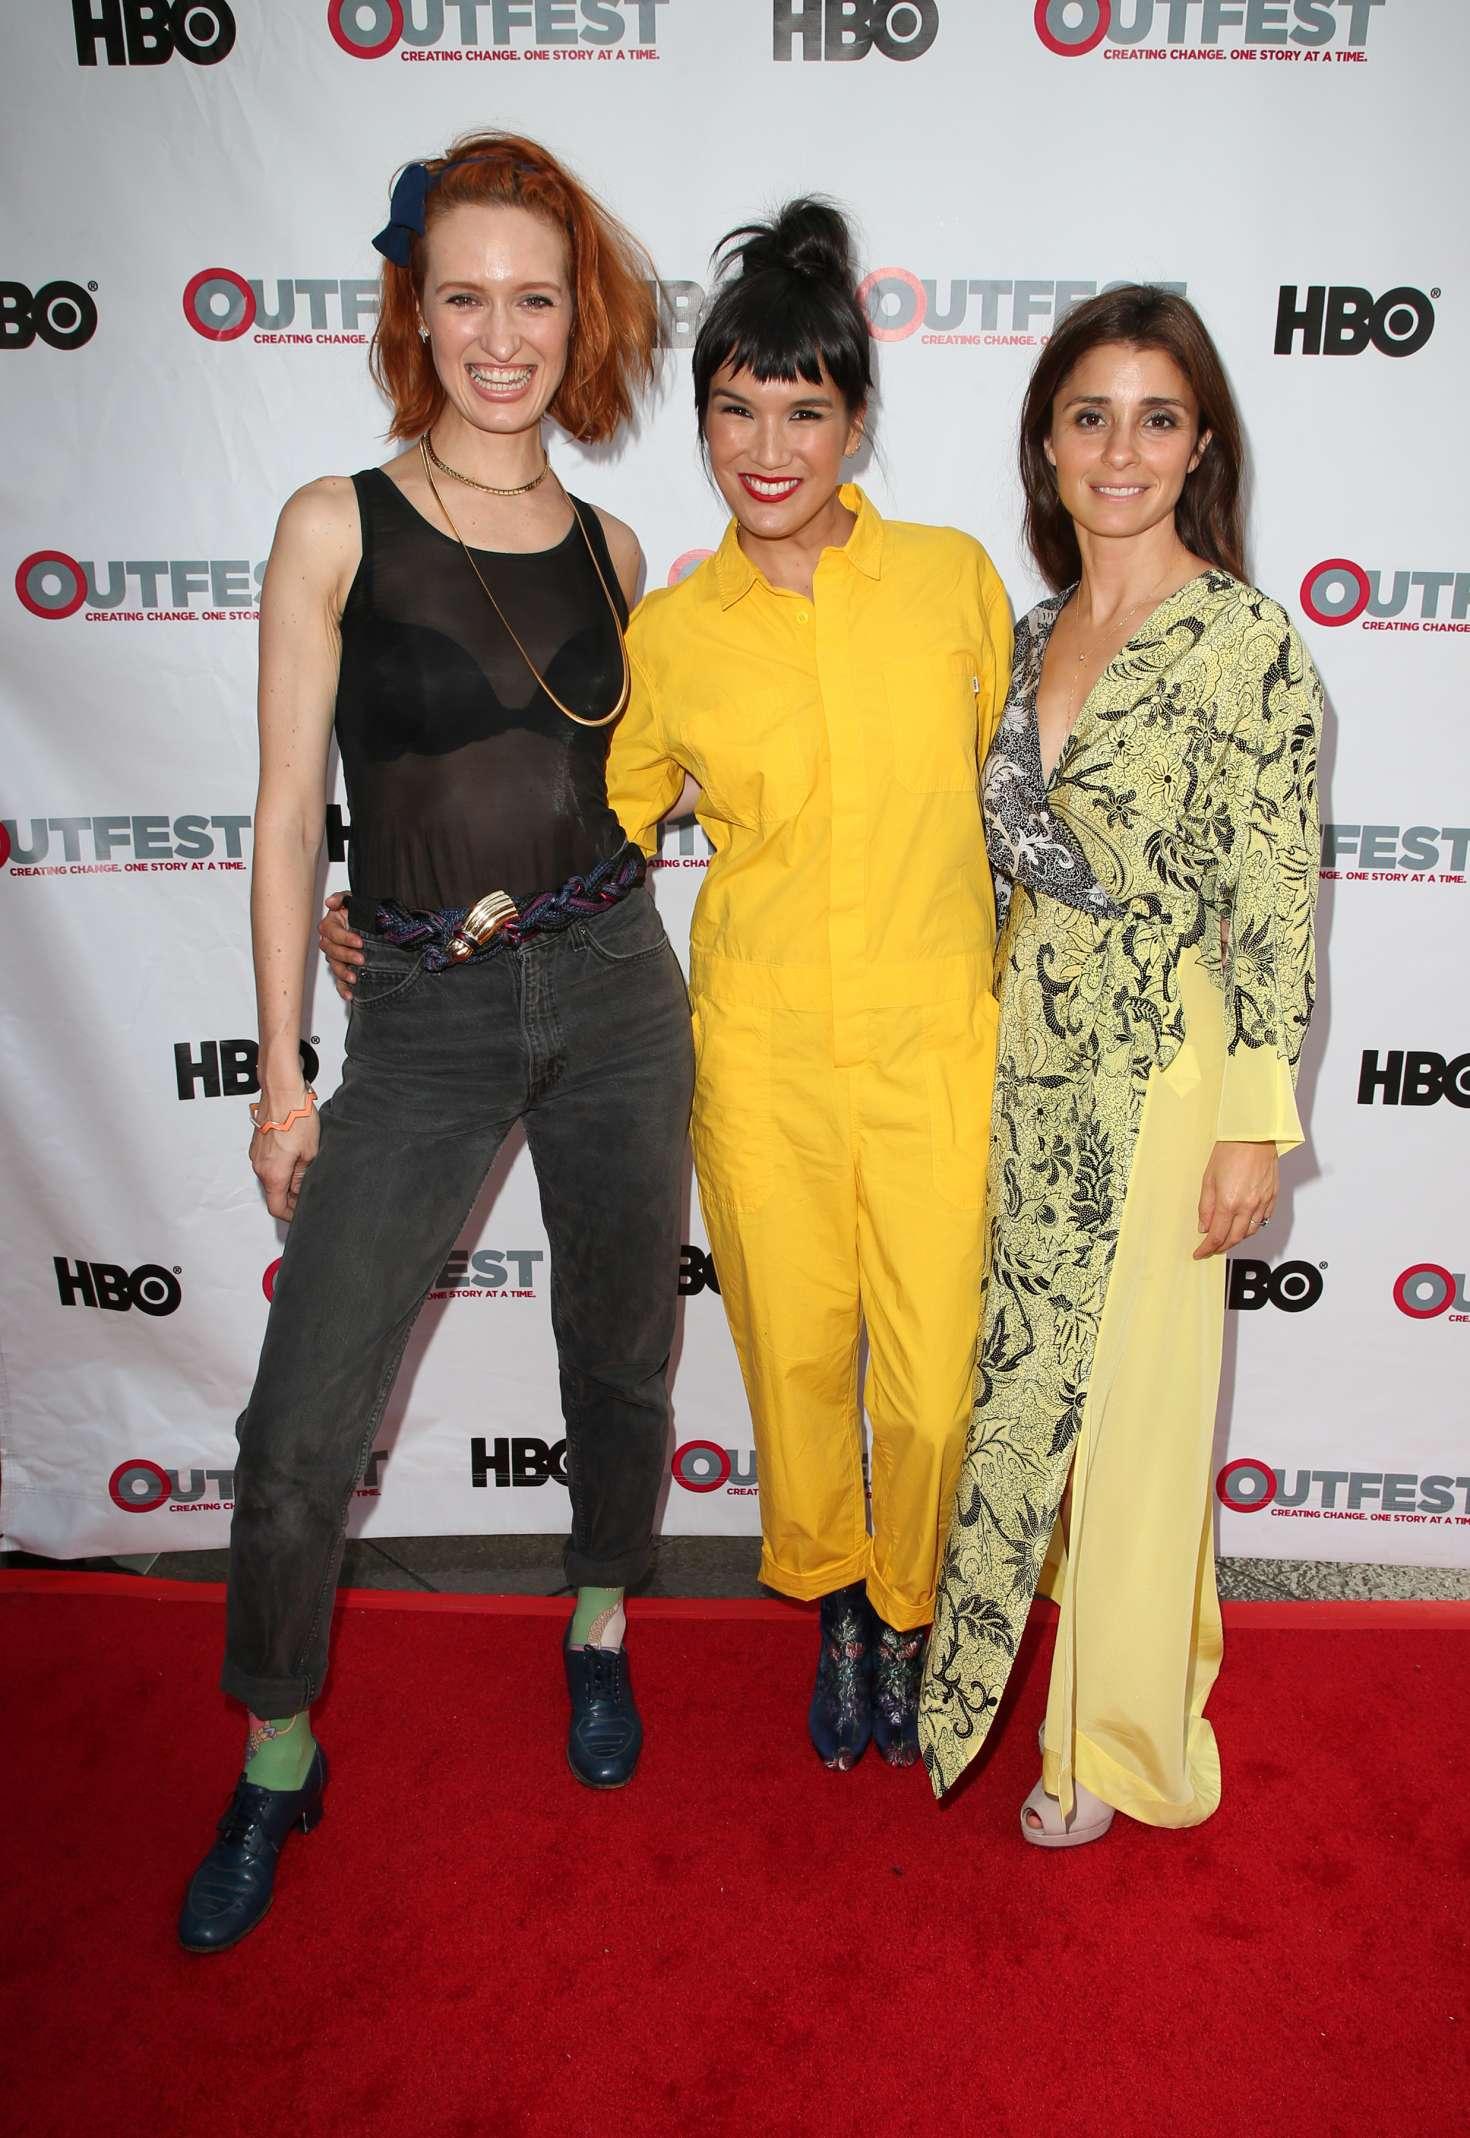 Shiri appleby strangers screening outfest los angeles lgbt film festival